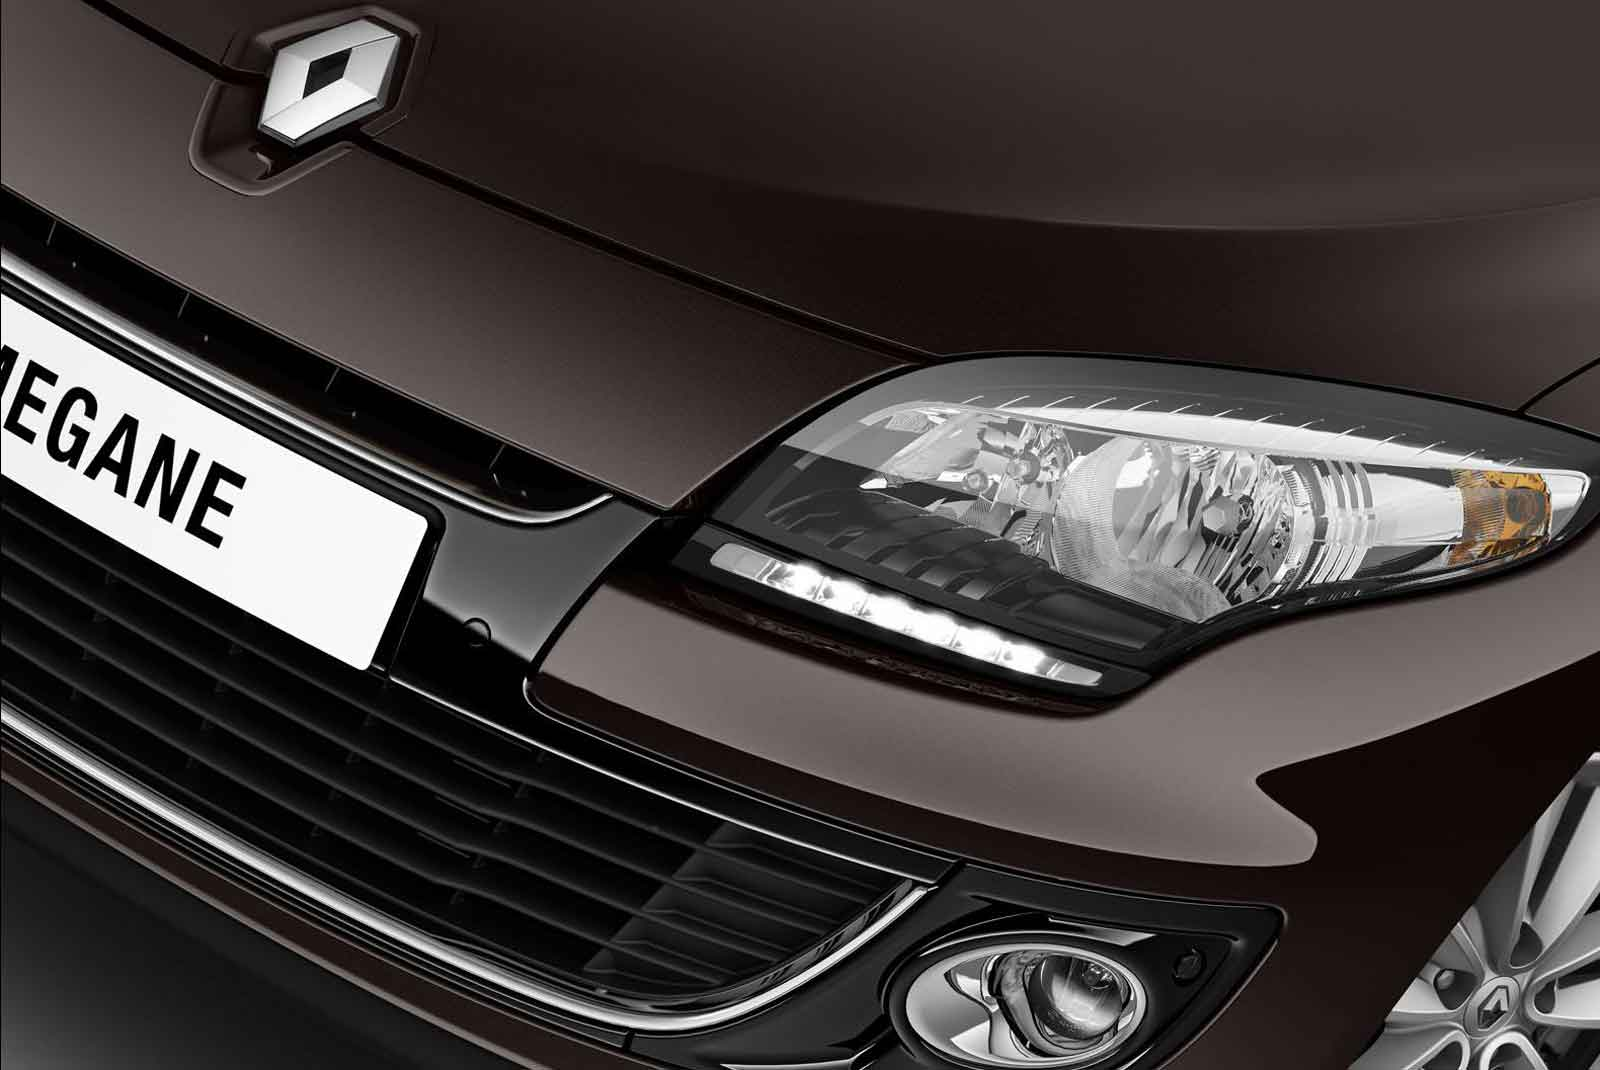 Renault Меган 2014 фото